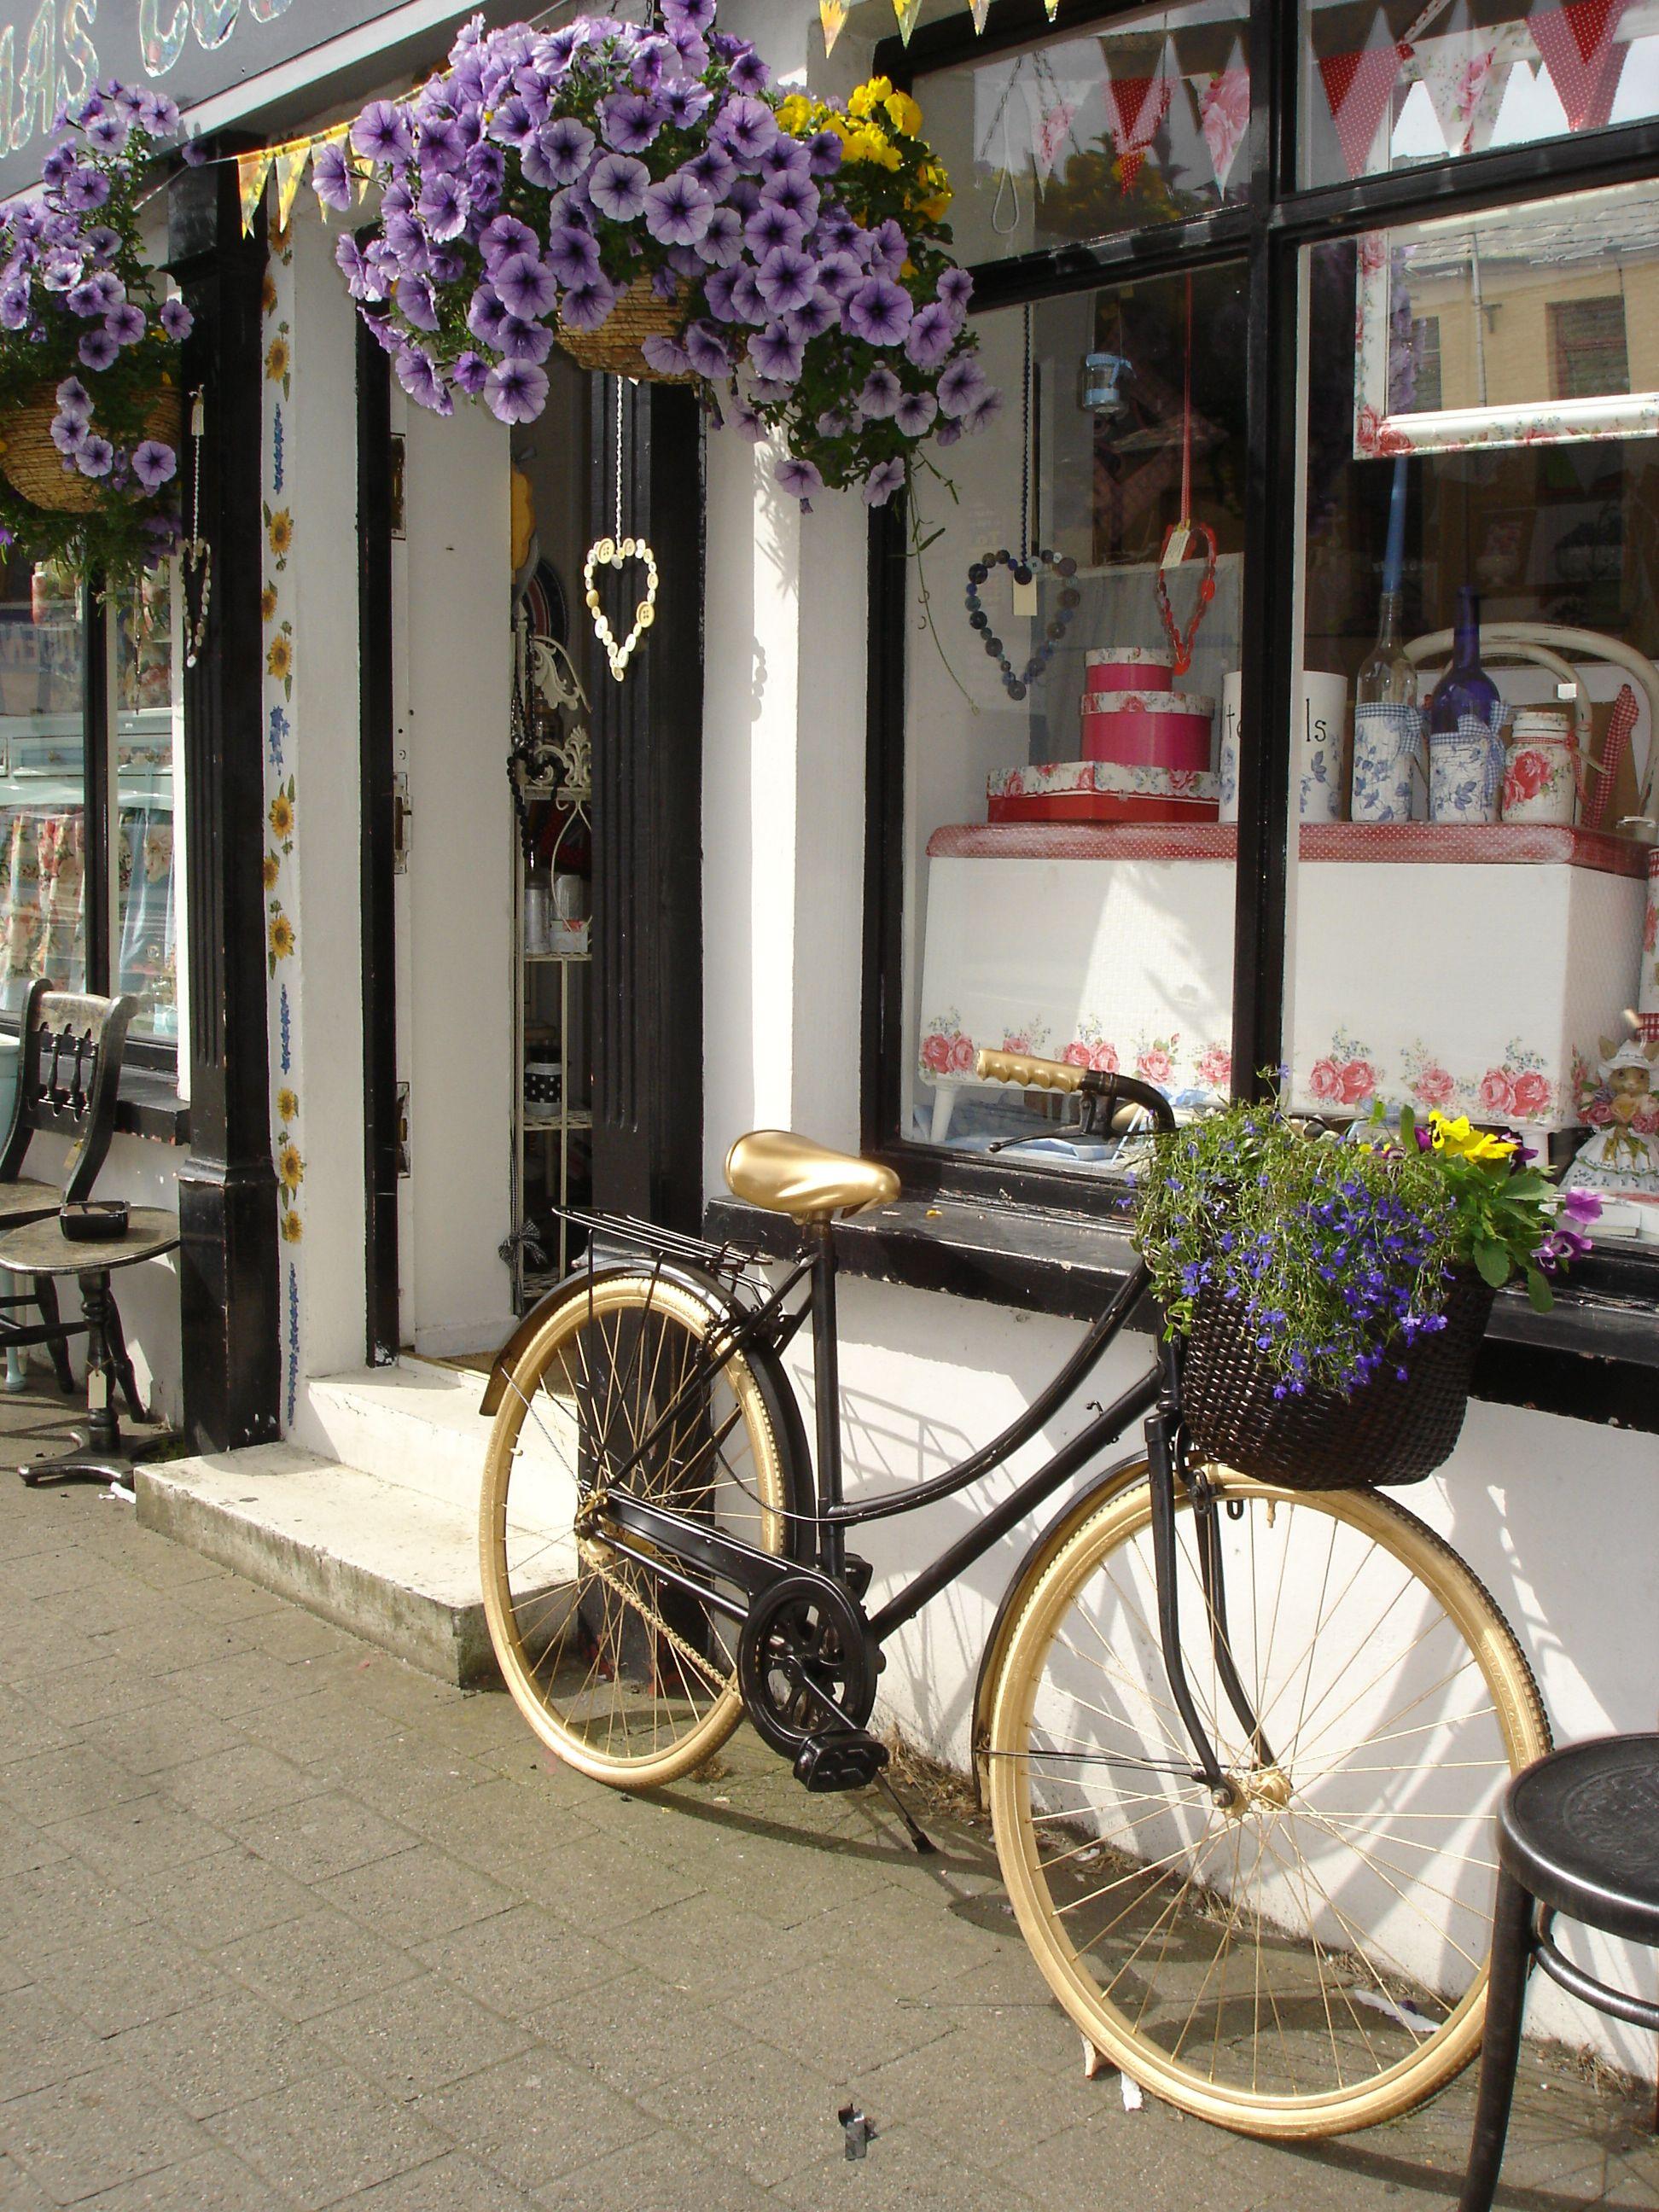 Front Of My Shop In Northern Ireland With Vintage Bike Www Mishascountryworkshop Co Uk With Images Shop Fronts Little Cottage Vintage Shops